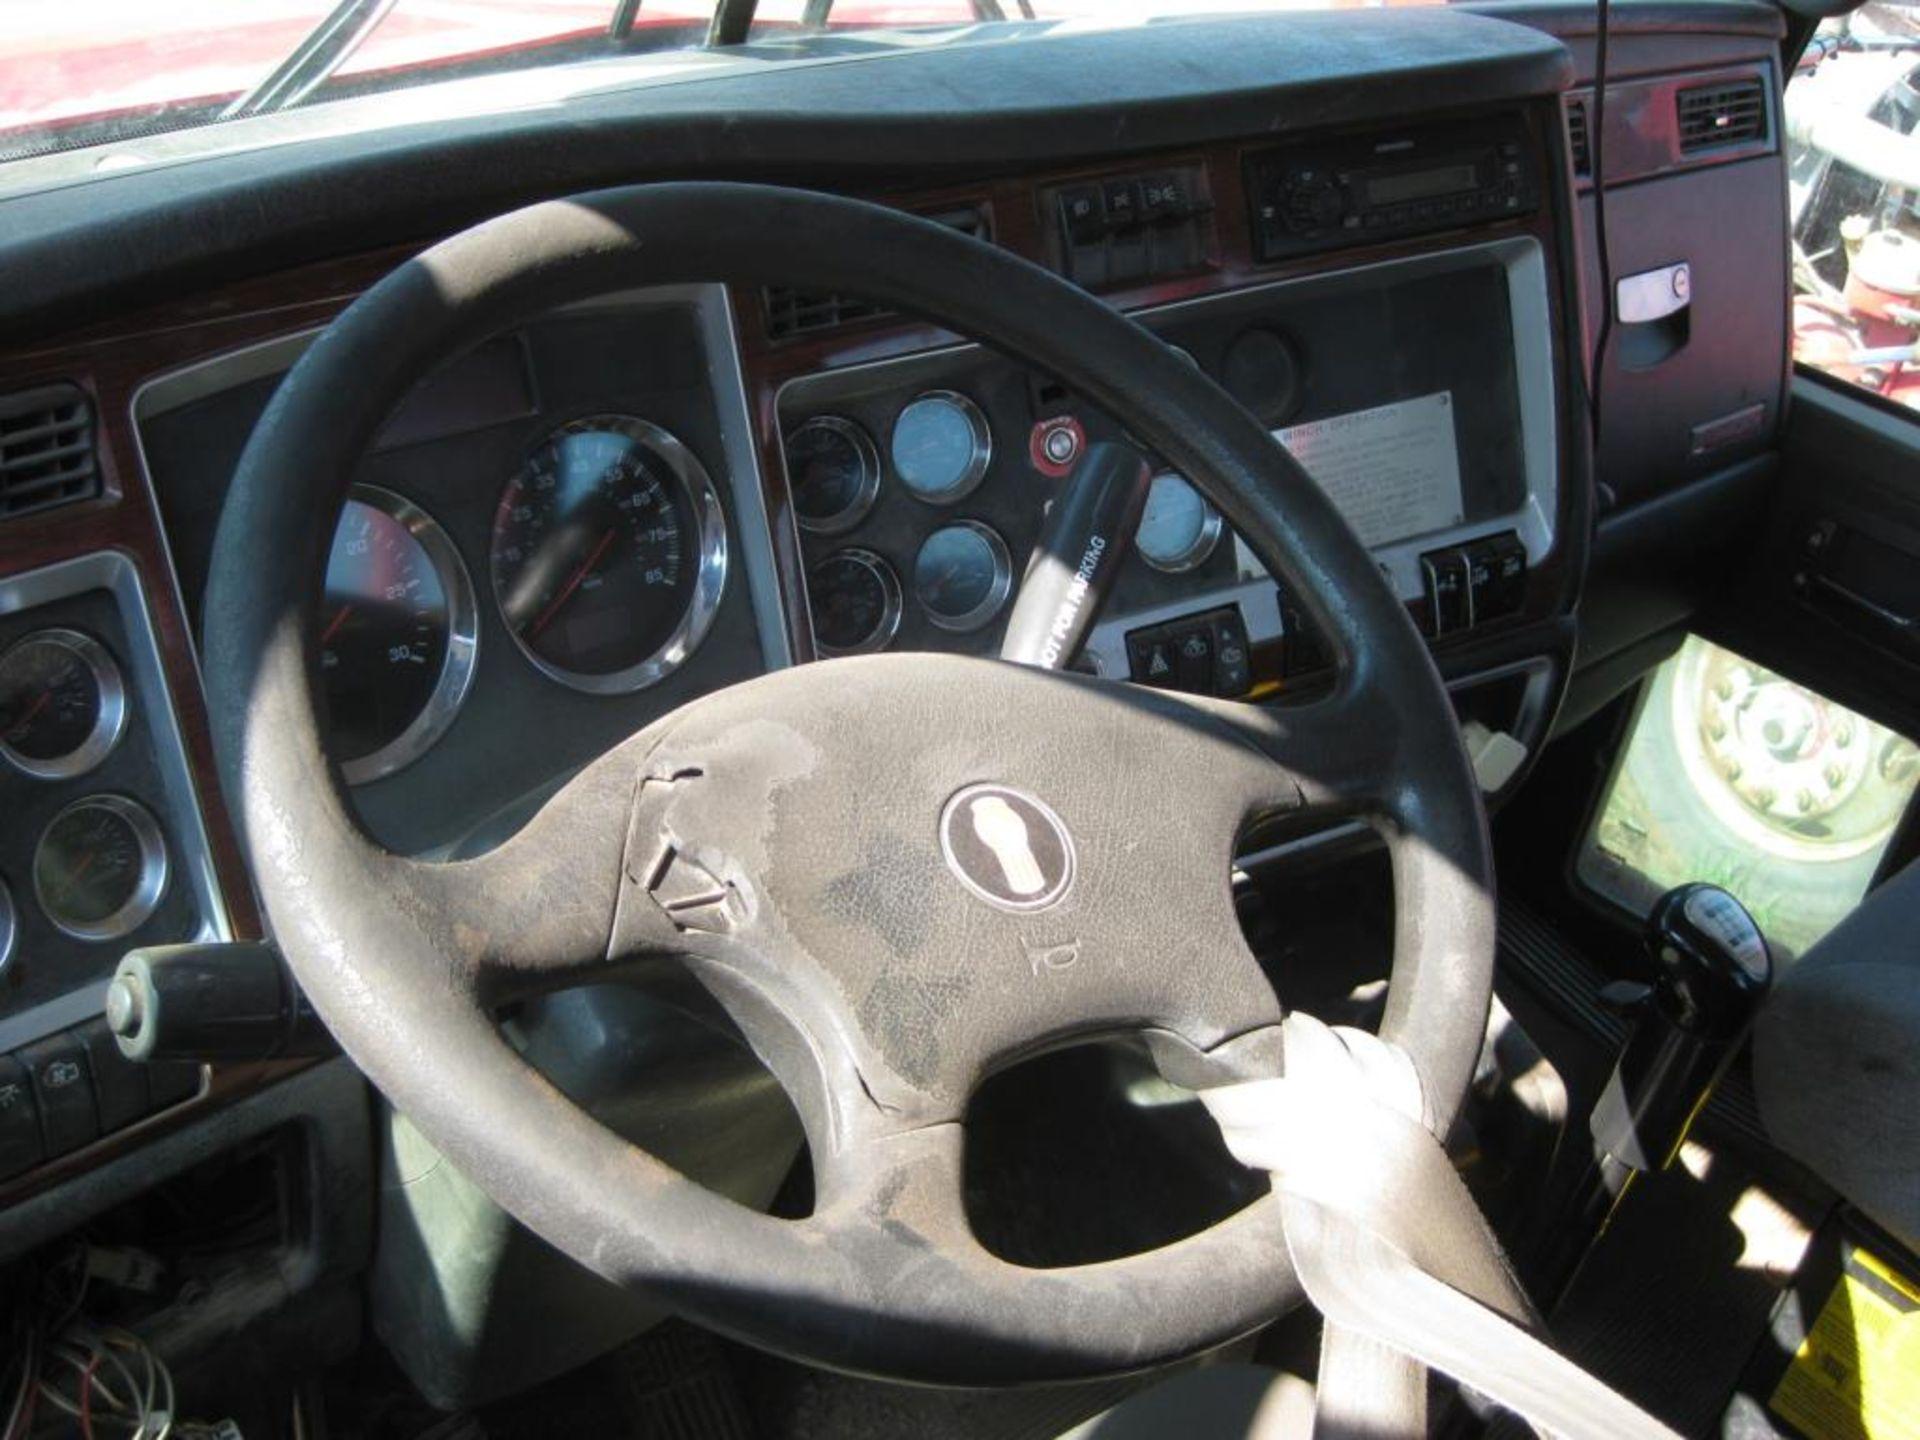 Kenworth Winch Truck - Image 16 of 25